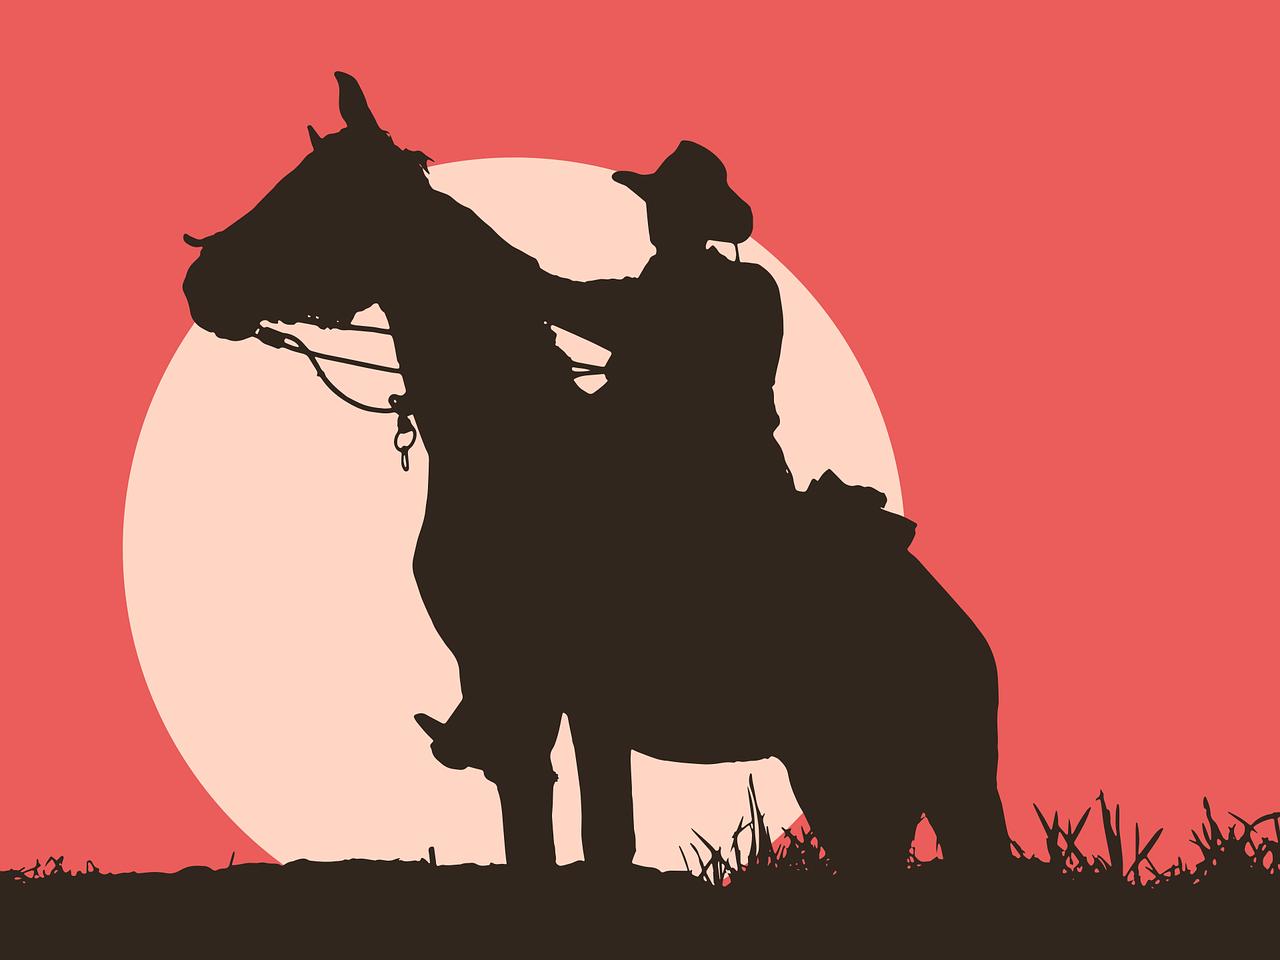 The American Cowboy - Historical Cowboys